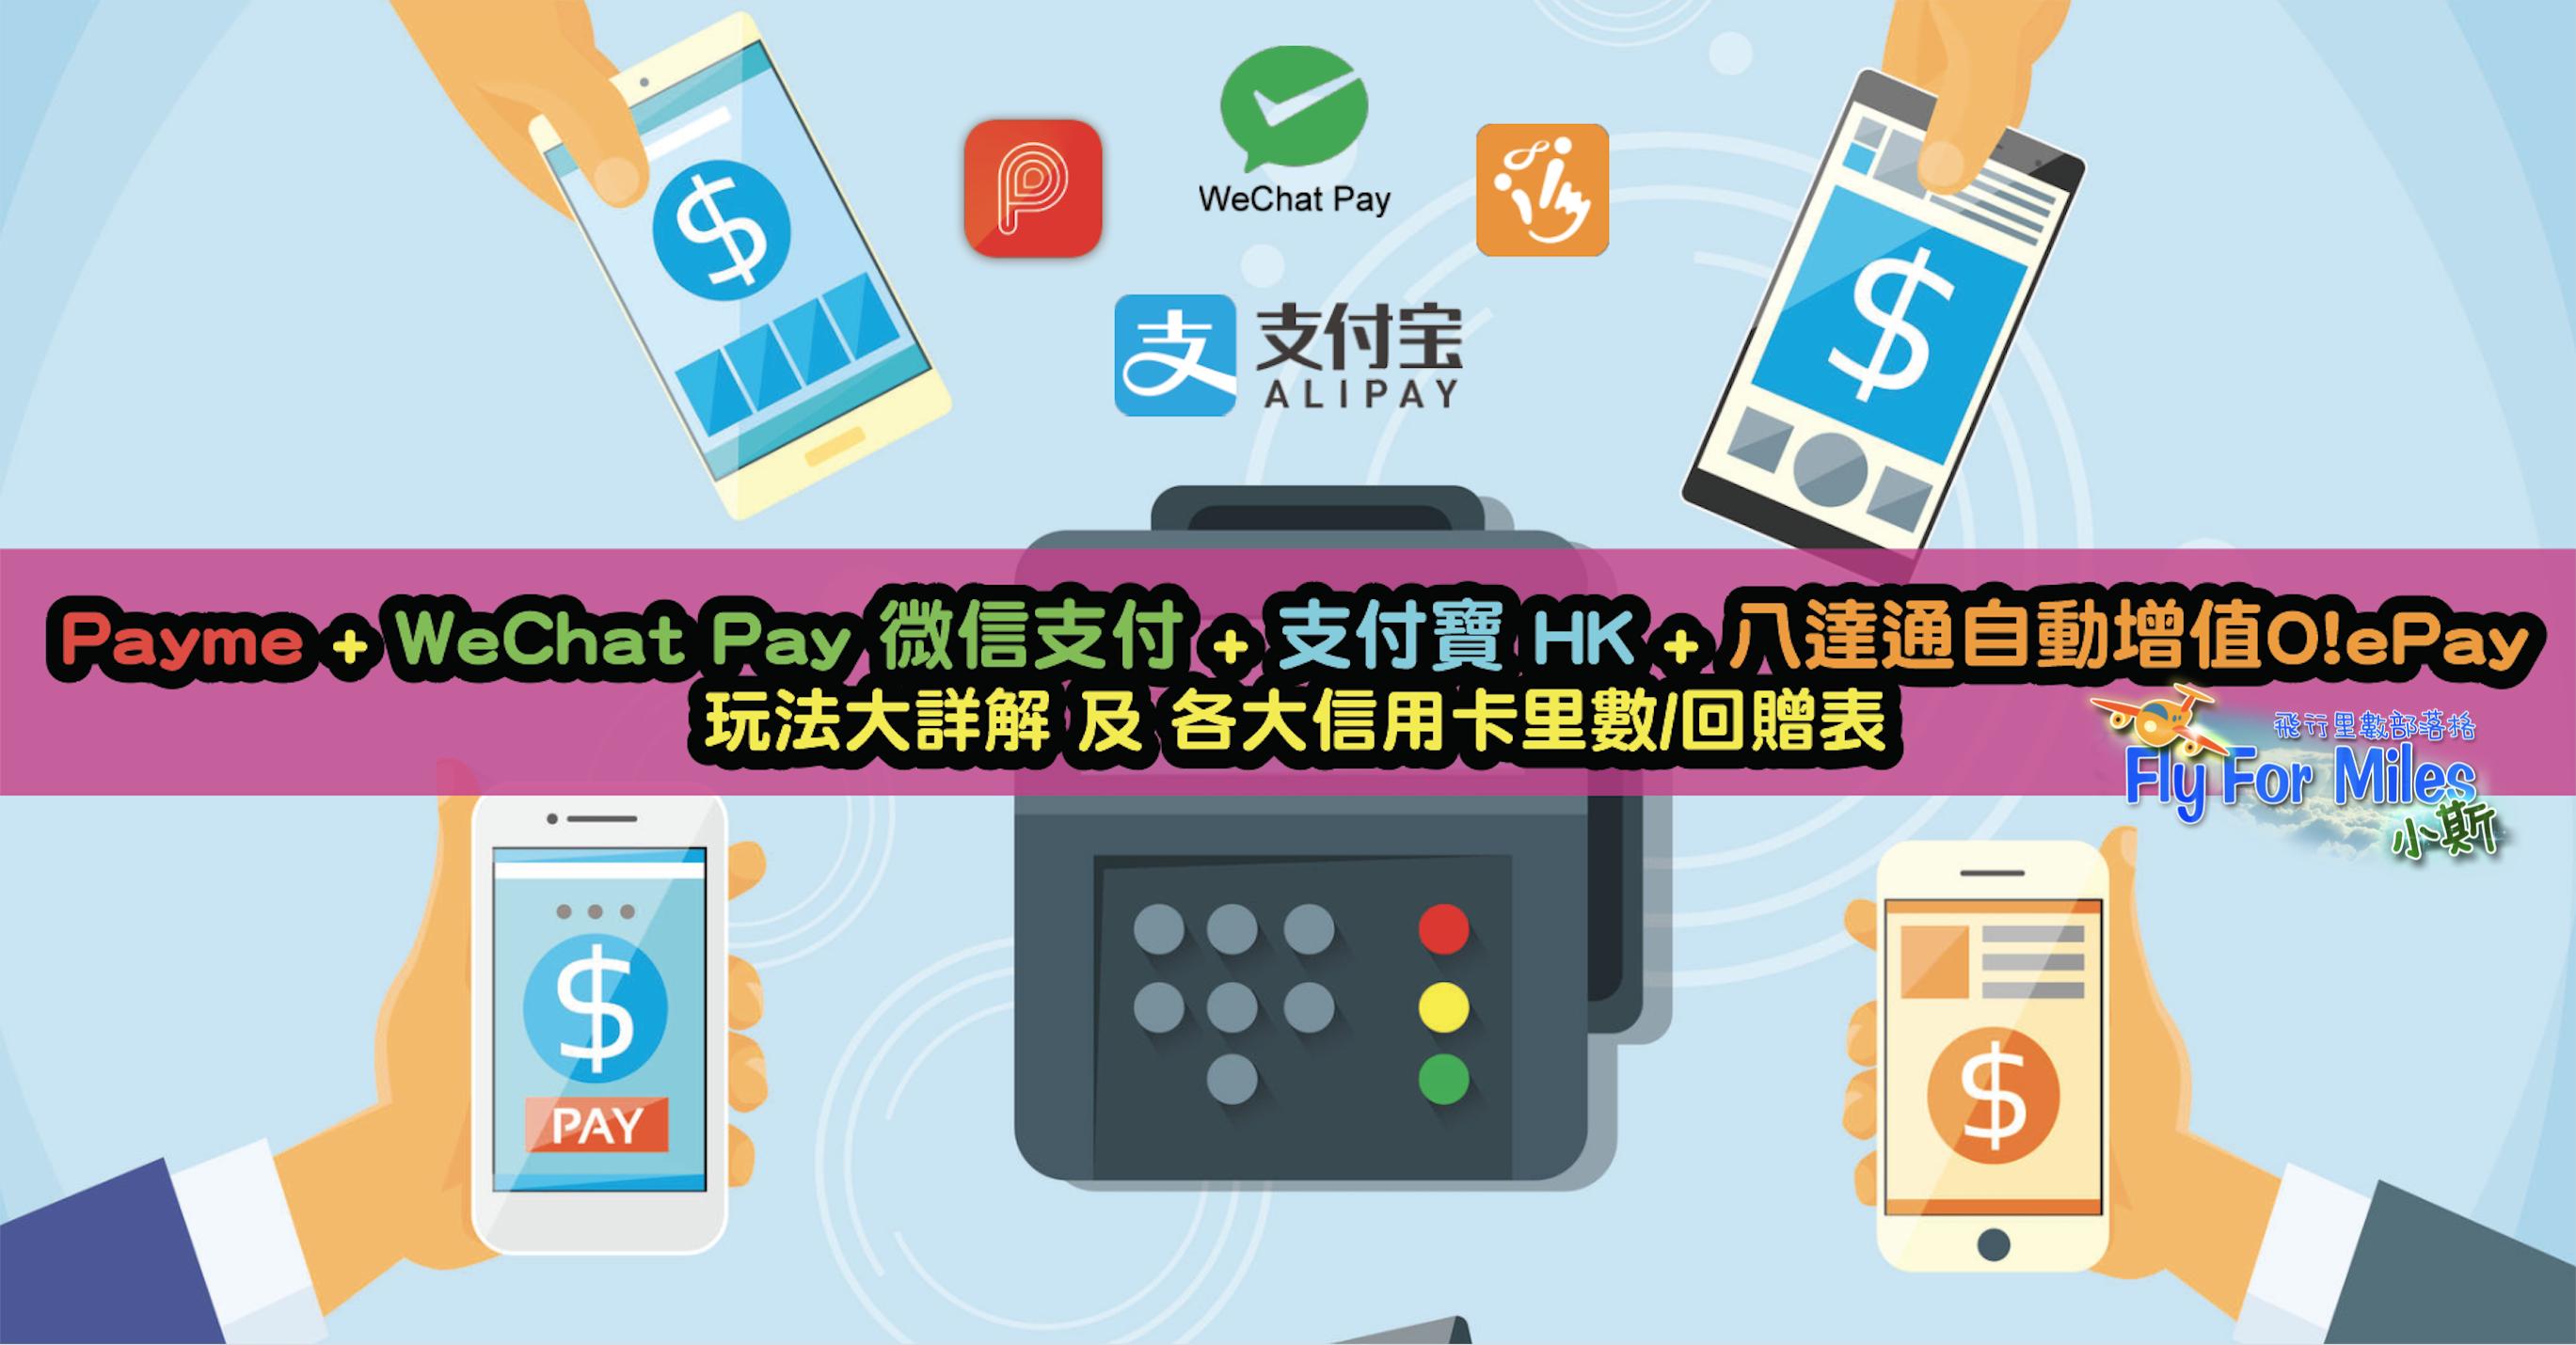 Payme + WeChat Pay 微信支付 + 支付寶 HK + 八達通自動增值O!ePay 玩法大詳解 及 各大信用卡里數/回贈表